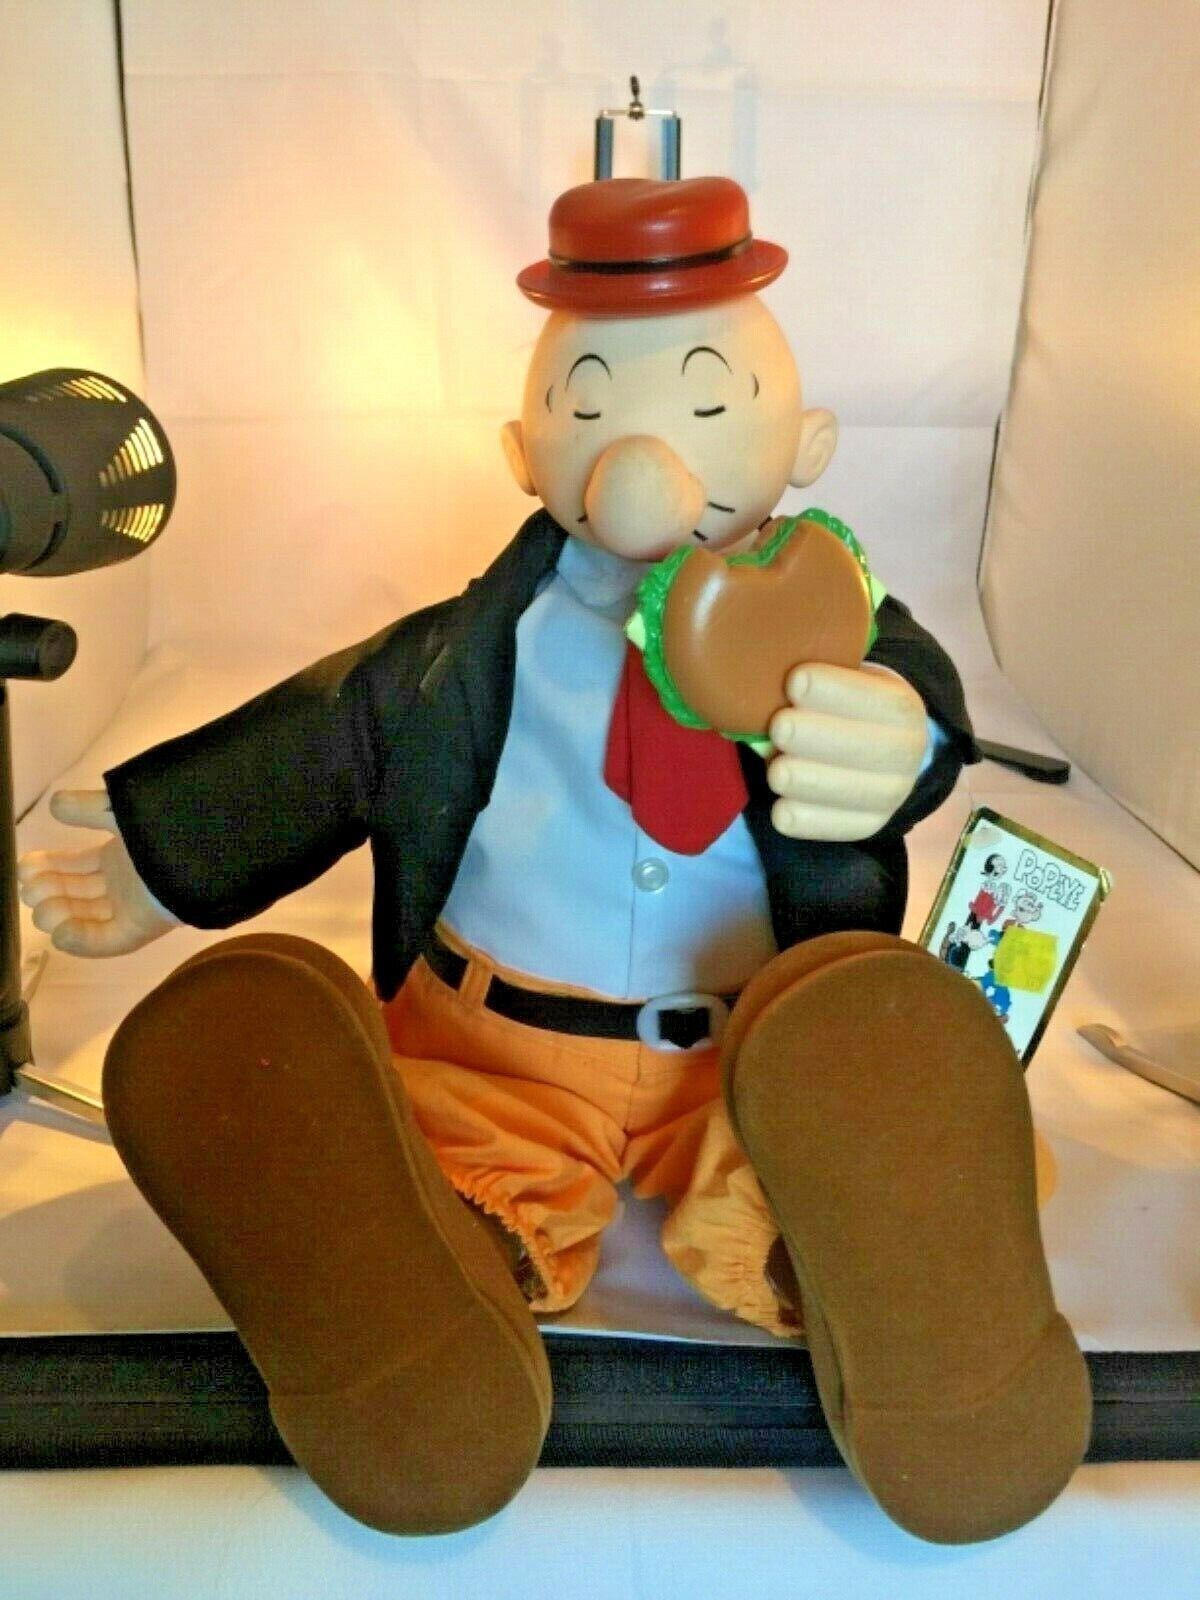 Big Wimpy Plush Doll w Cheeseburger från Popeye i perfekt skick Mycket sällsynt